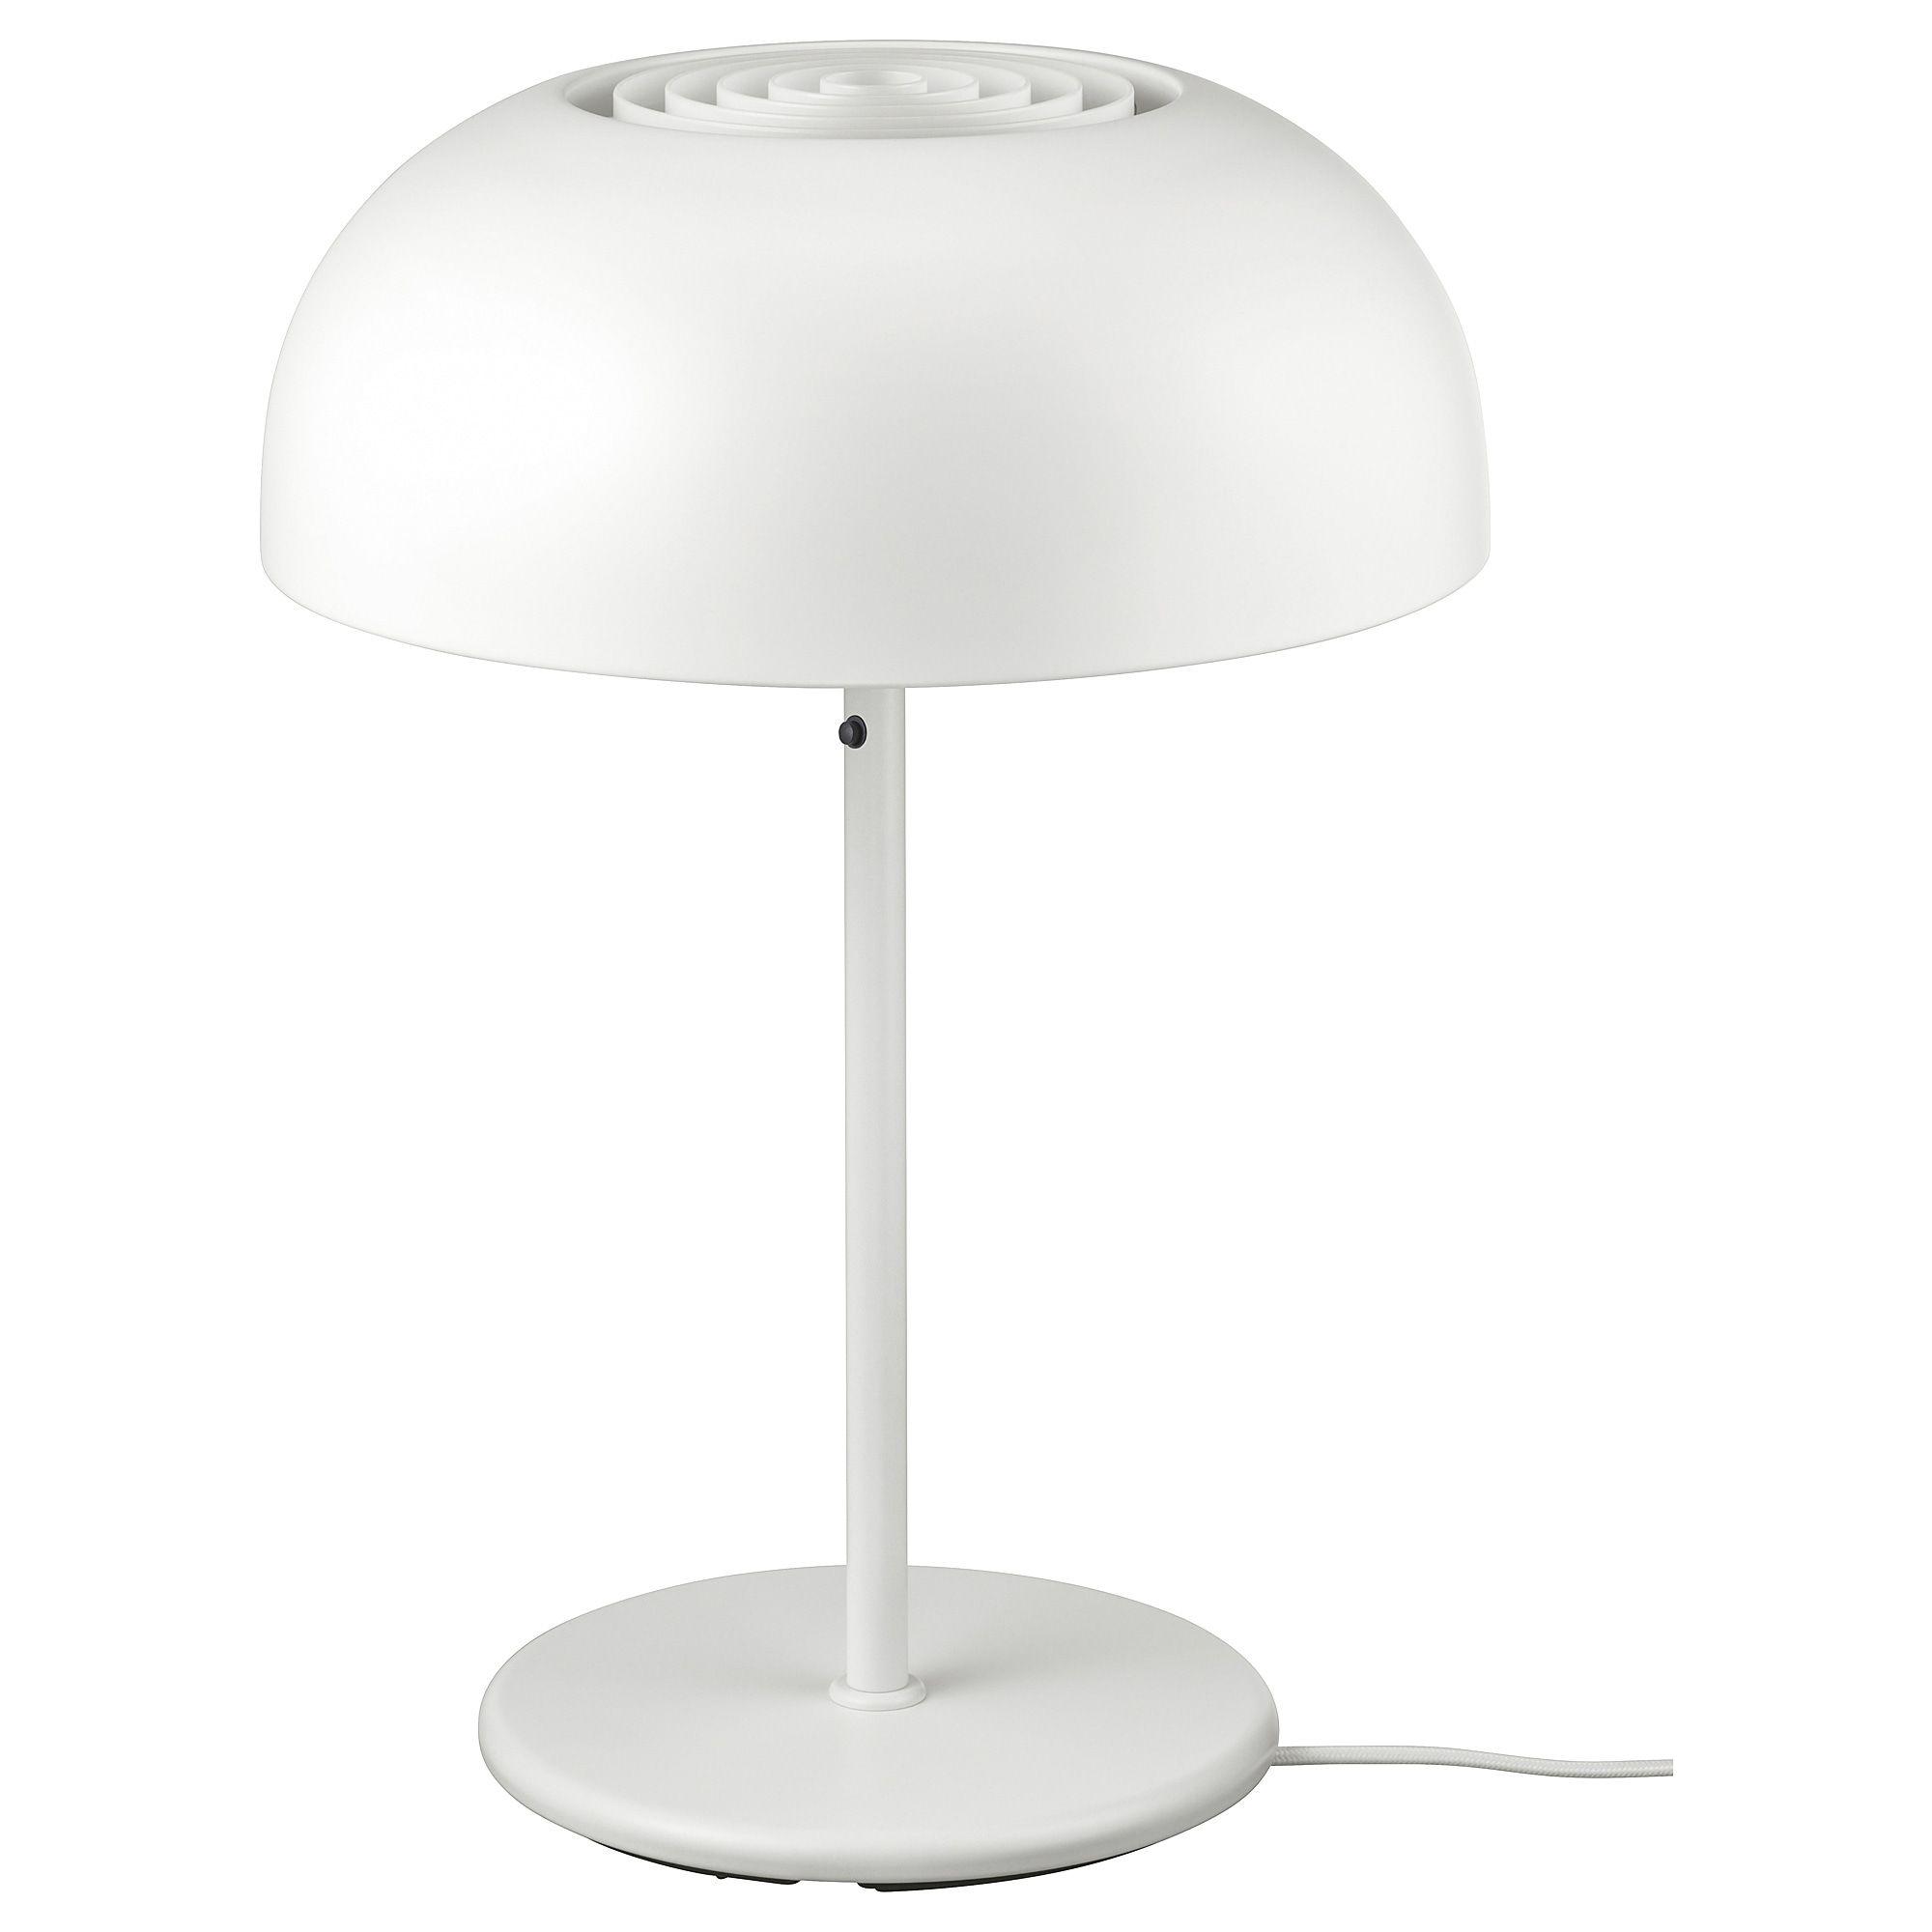 ikea lampes de table ikea lampe